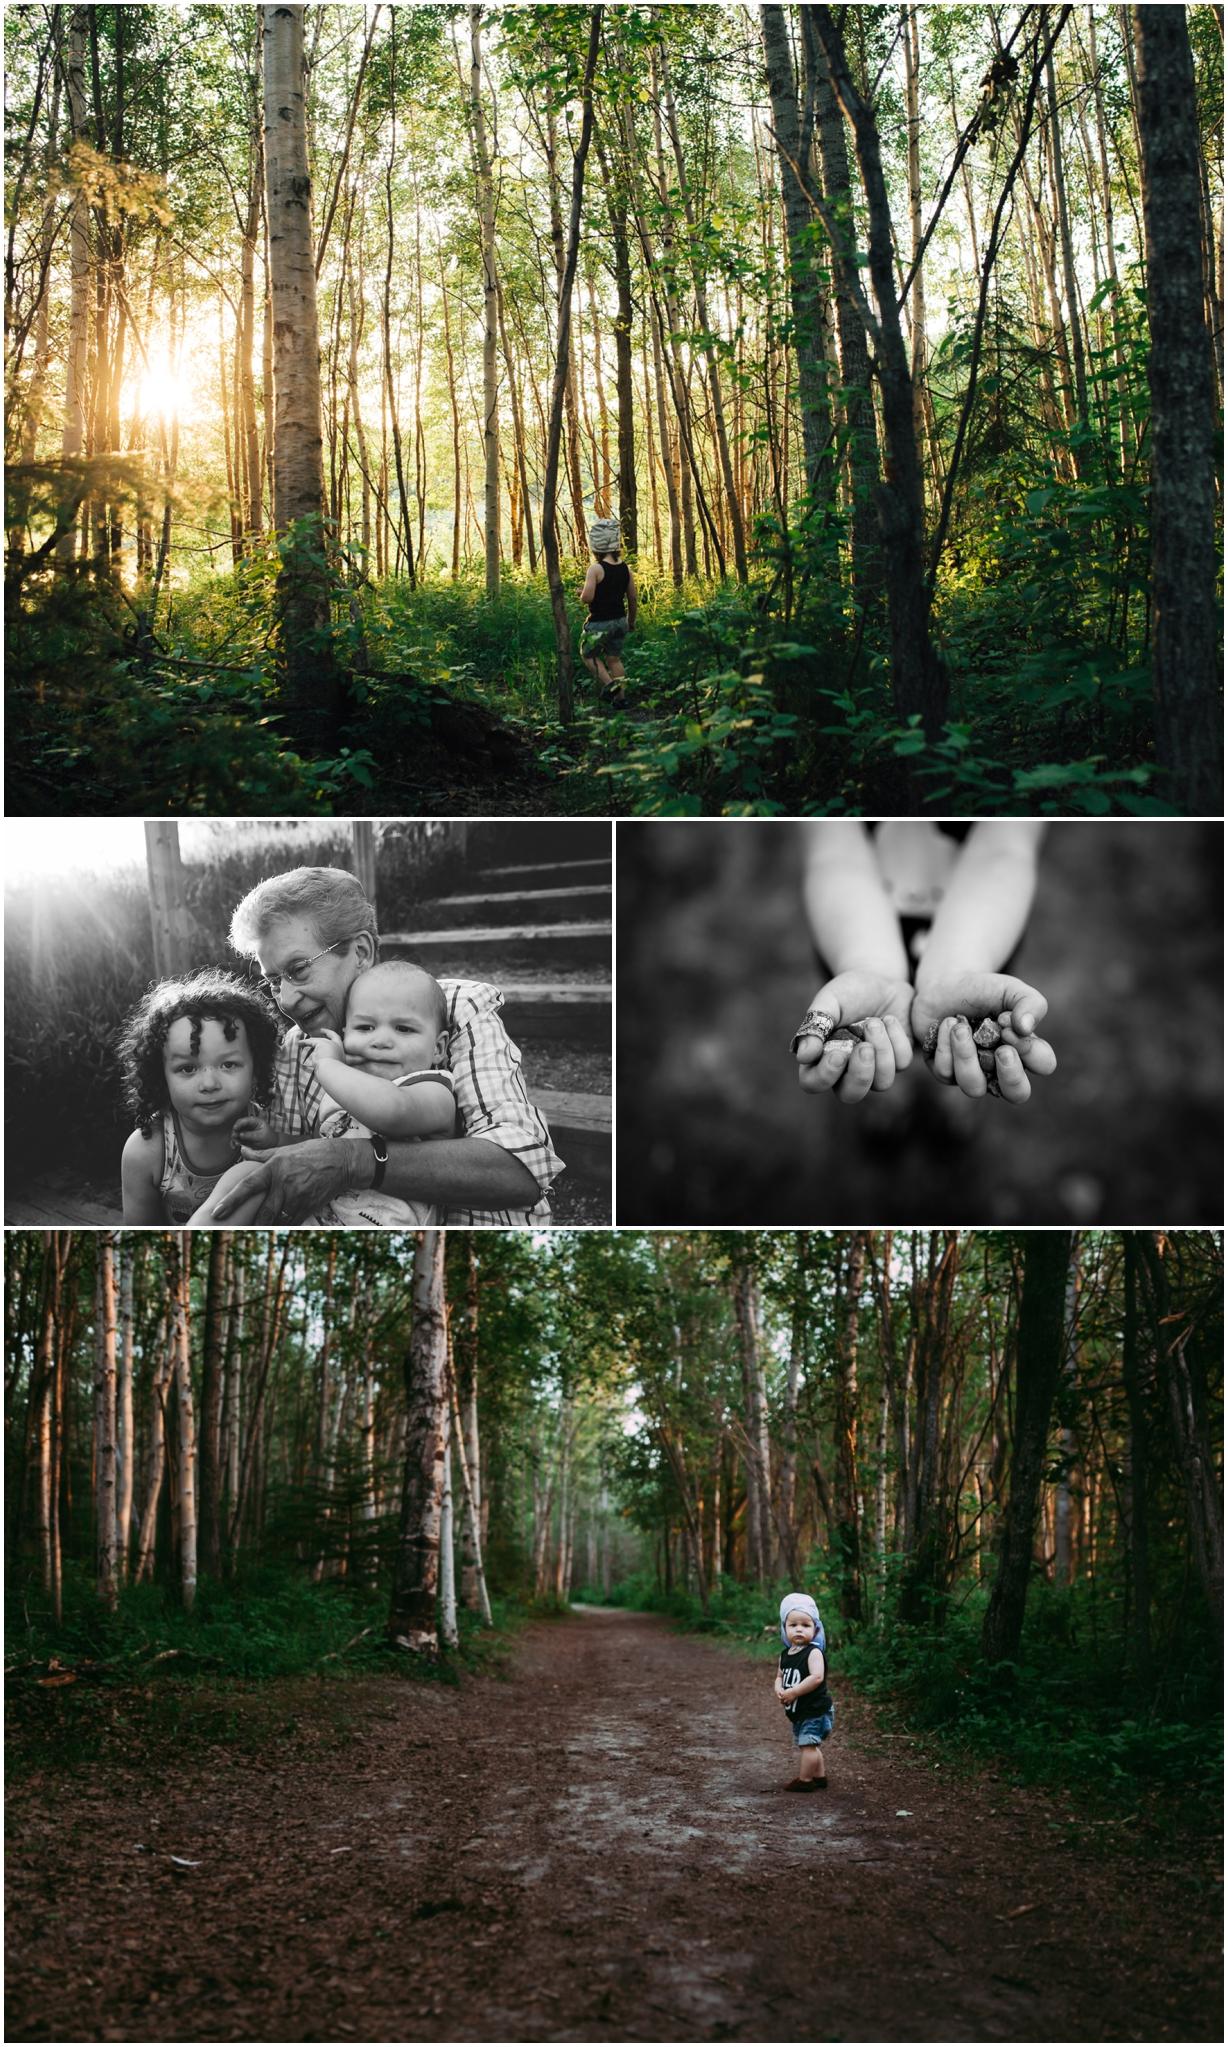 Edmonton Lifestyle Photographer - Best of 2016 - Great Grandma - Family Time Lake Adventures